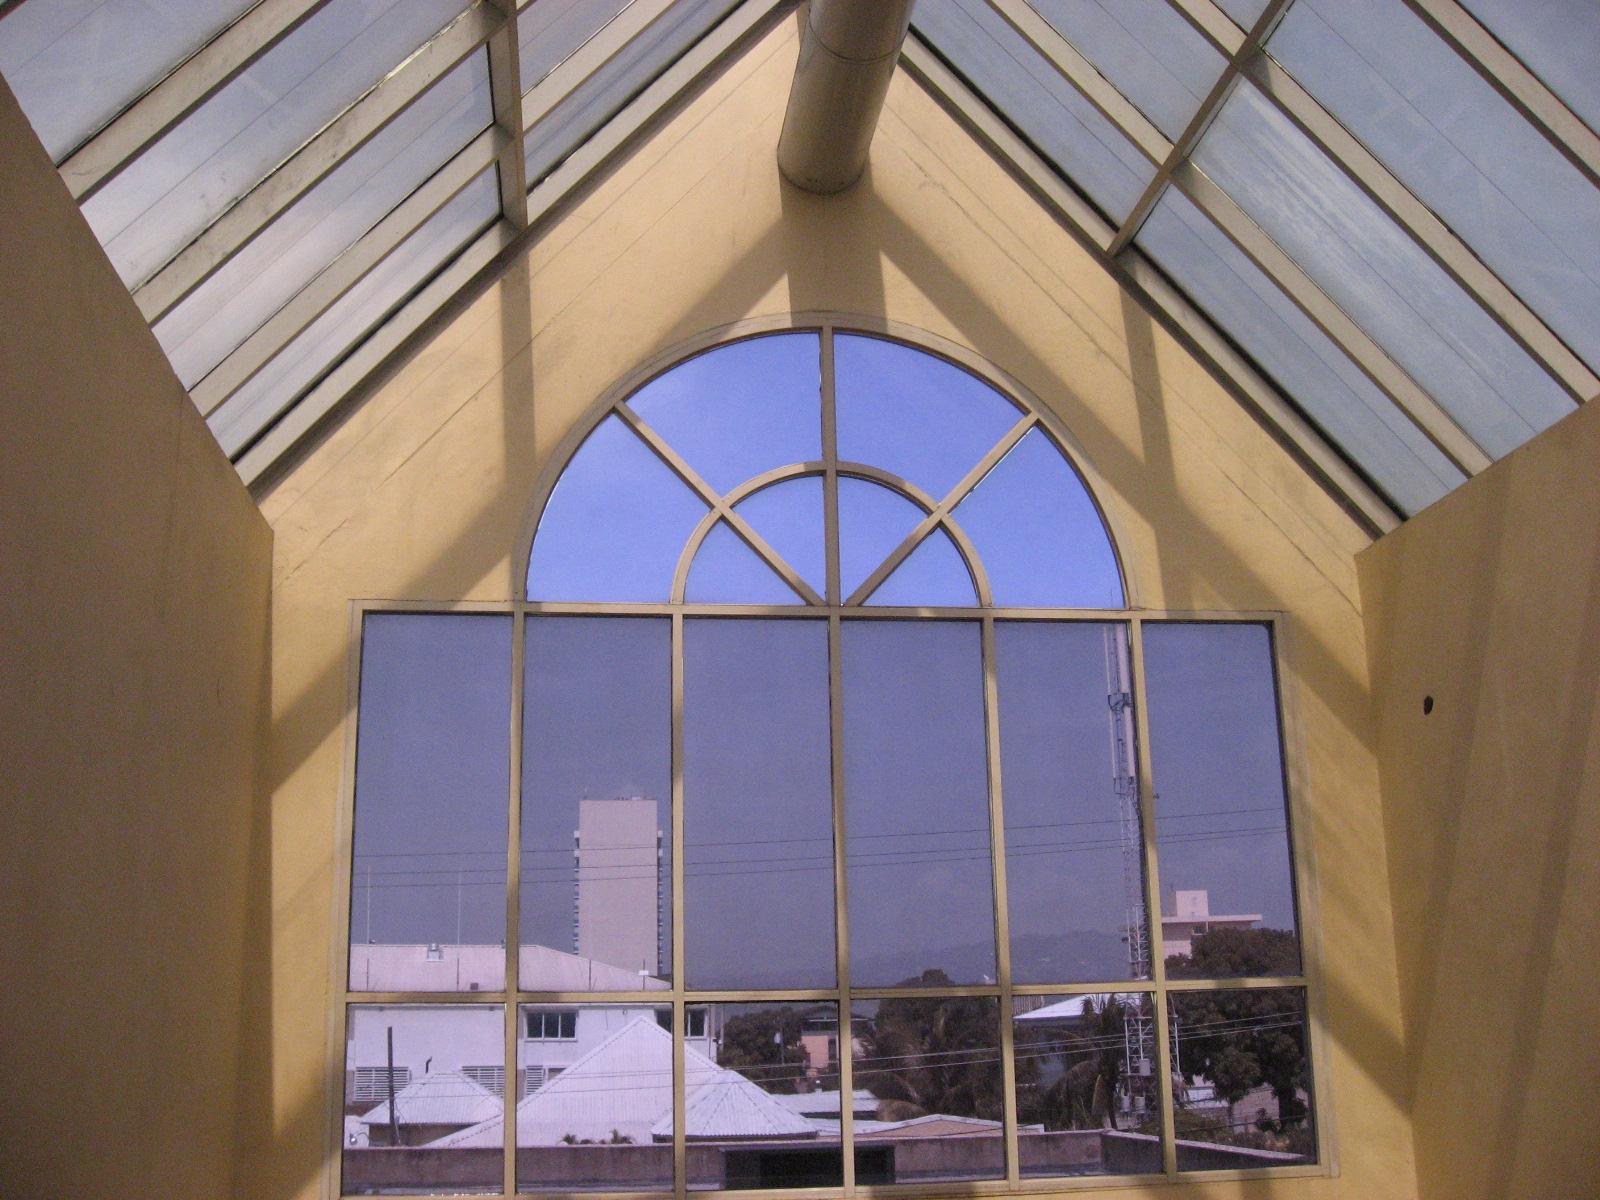 Astounding Dhl Designer Builders 2 Belmont Road Kingston Jamaica Download Free Architecture Designs Scobabritishbridgeorg